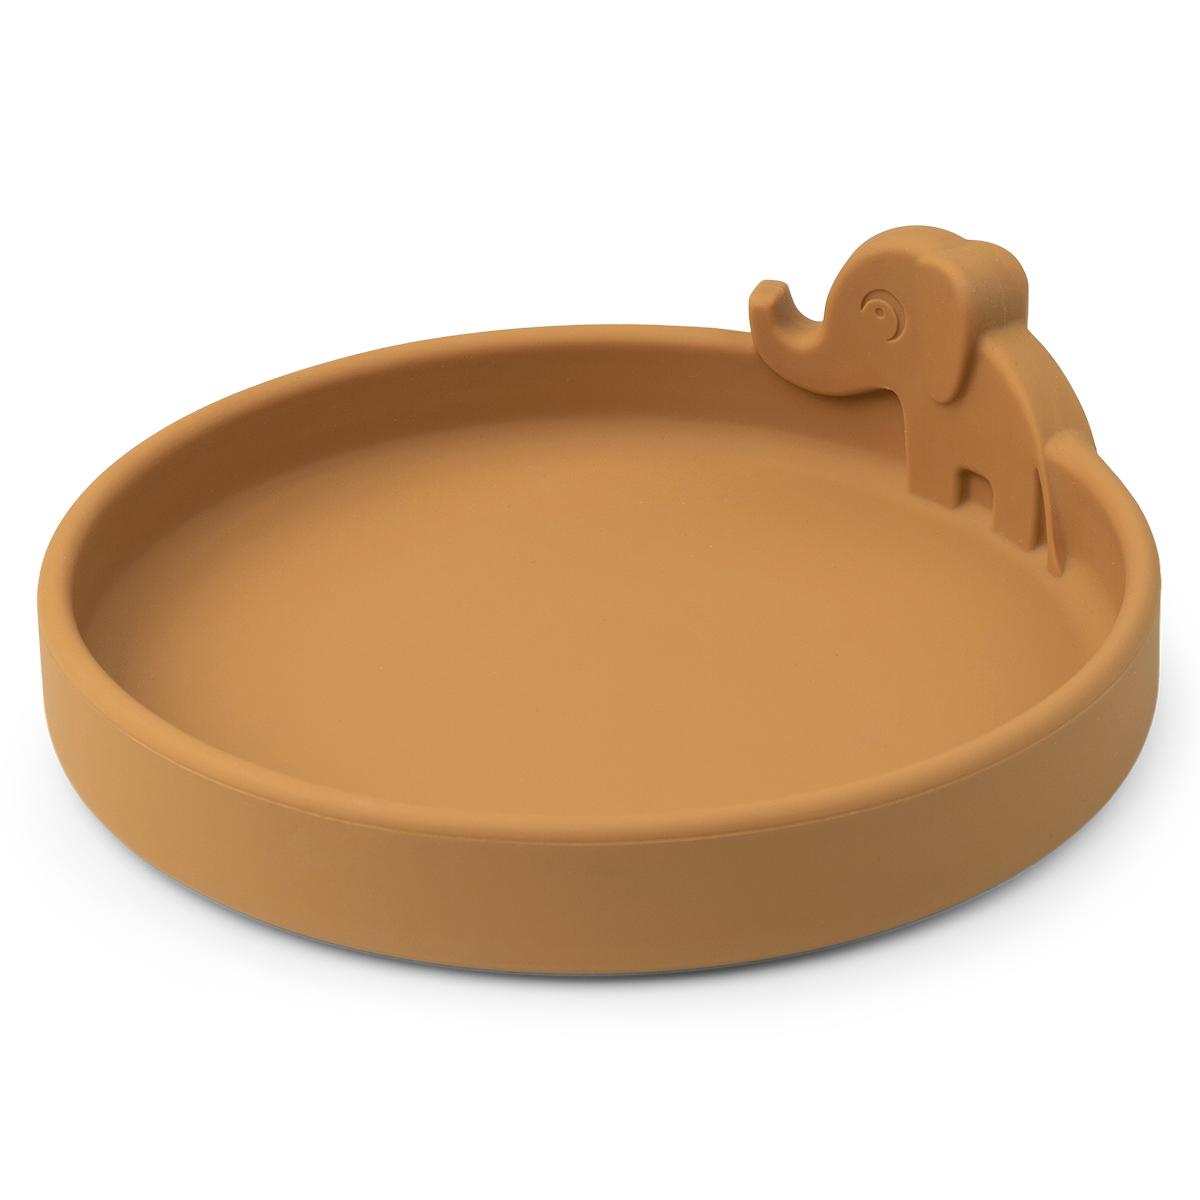 Vaisselle & Couvert Assiette Peekaboo Elphee - Moutarde Assiette Peekaboo Elphee - Moutarde